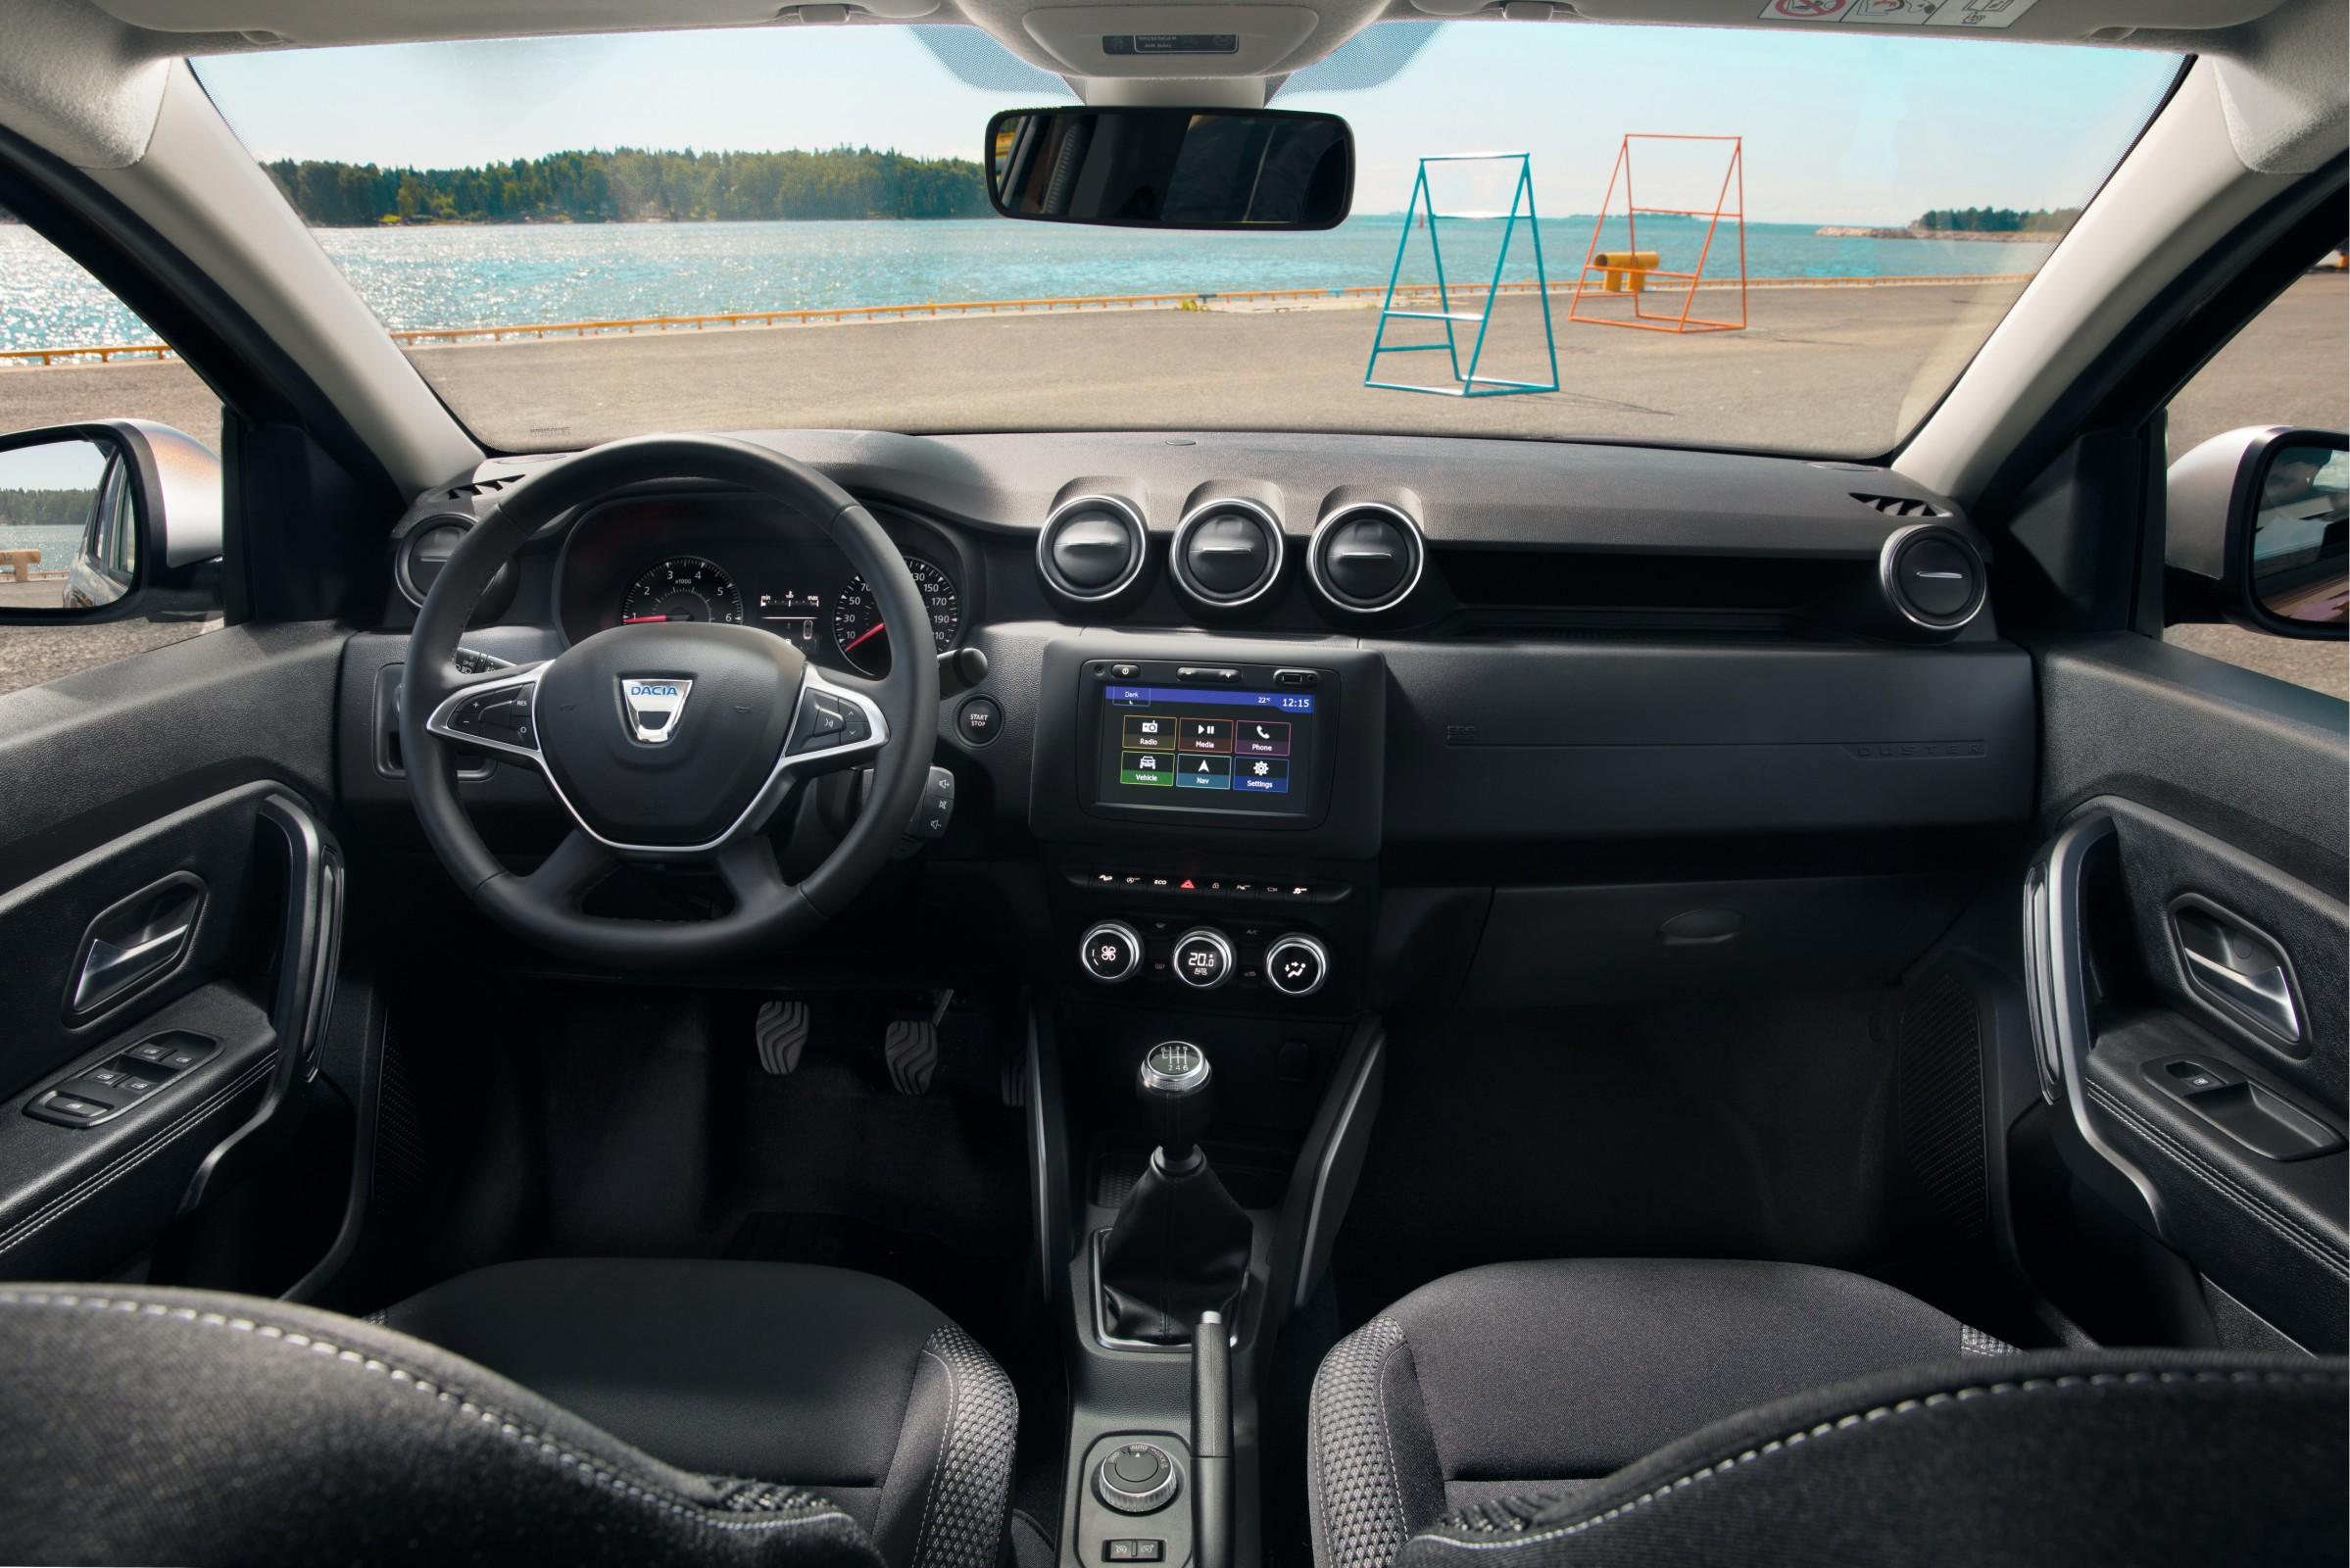 Novo Renault Dacia Duster 2018 Segunda Geracao